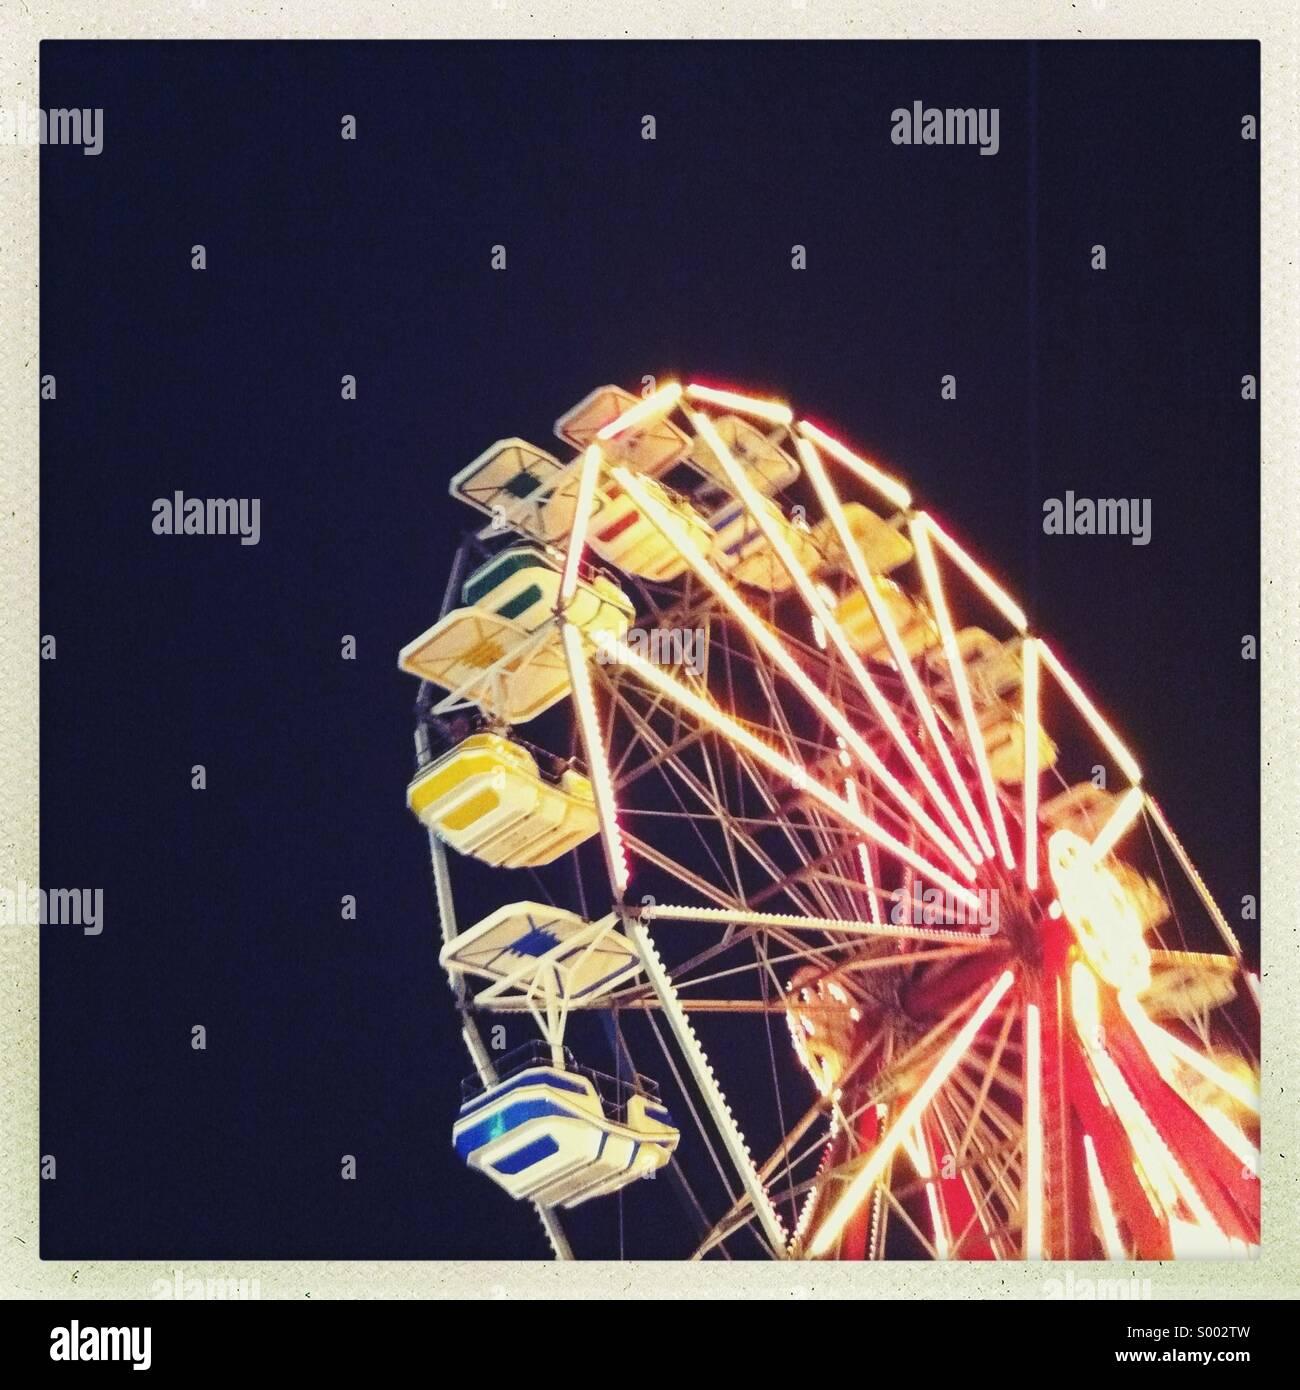 An amusement park Ferris wheel at night - Stock Image